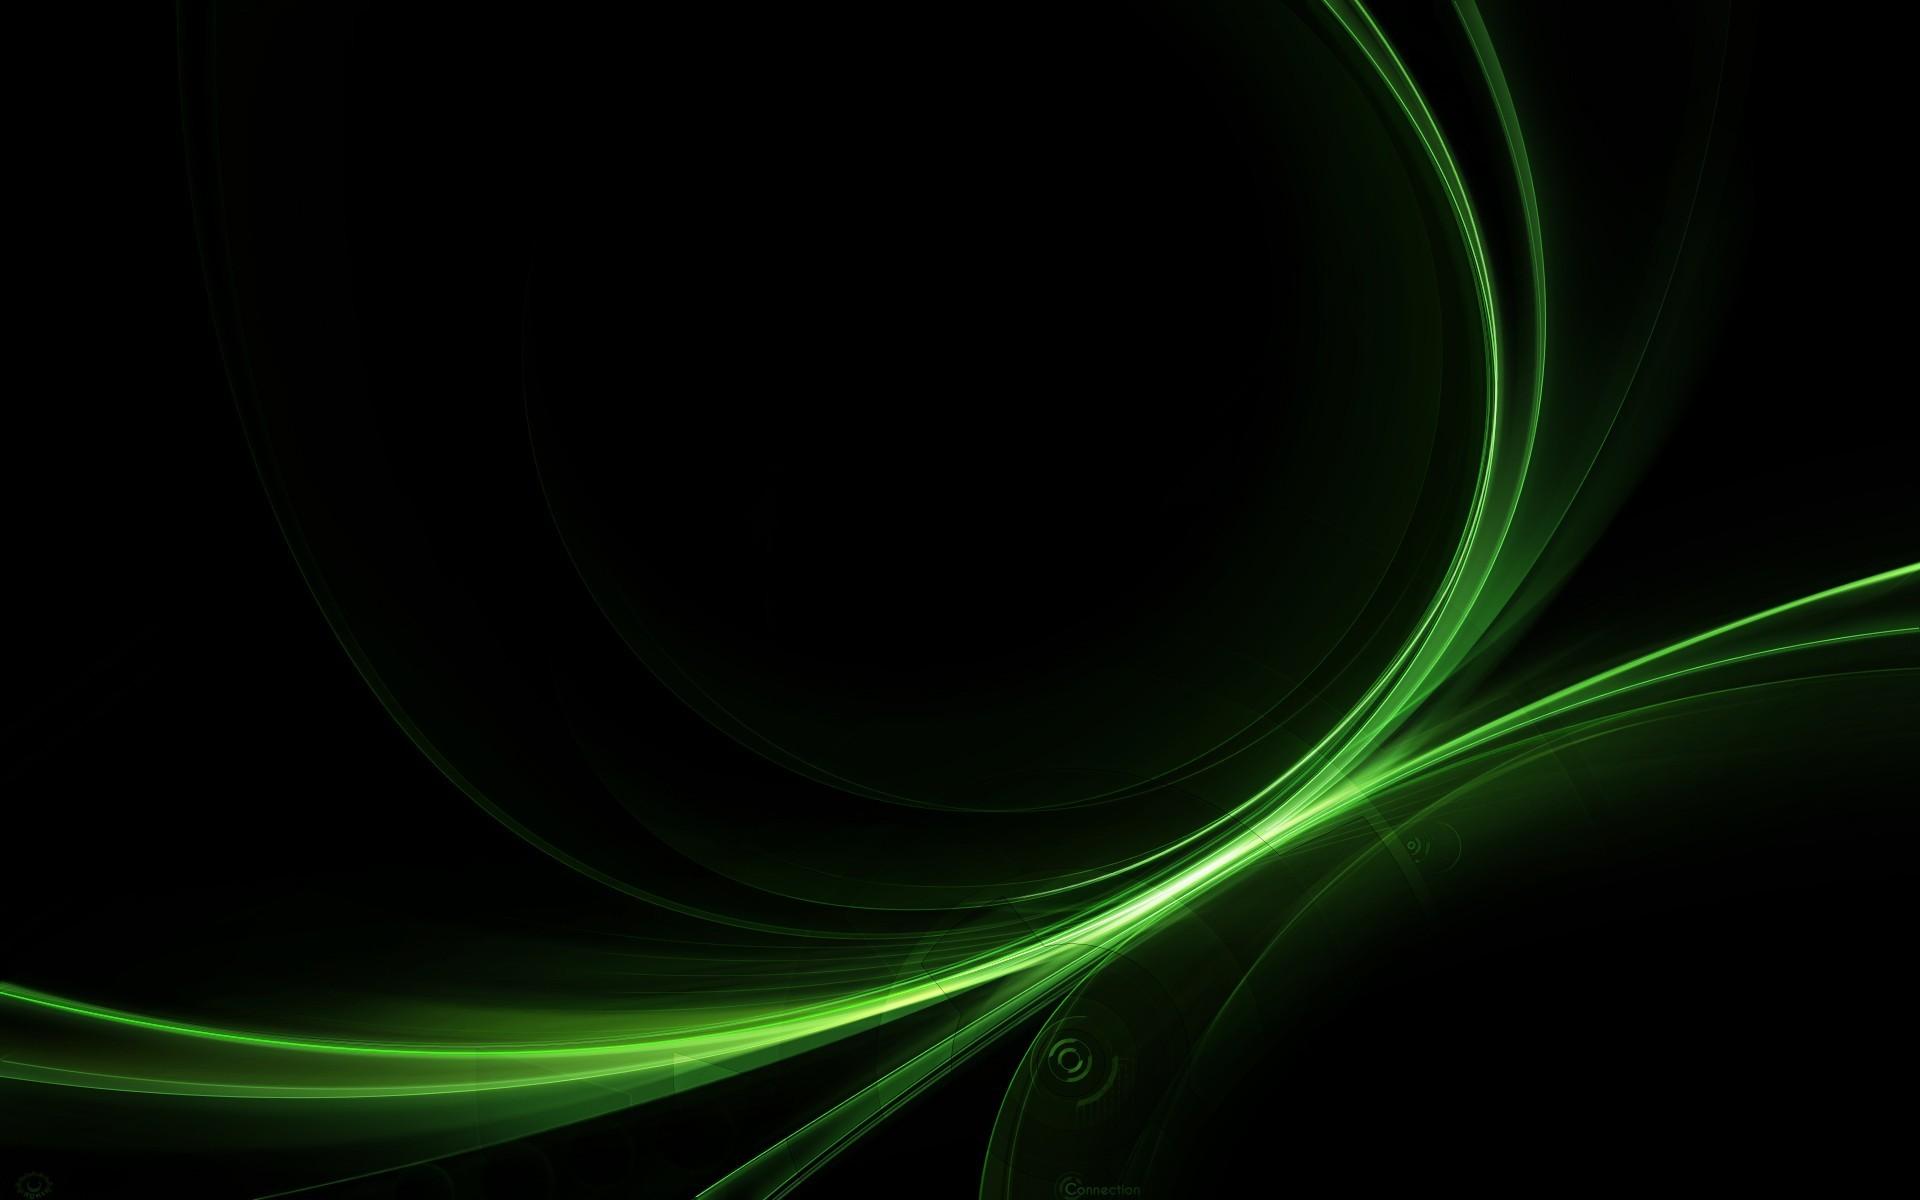 pin-green-abstract-dark-lines-wallpaper-high-definition-